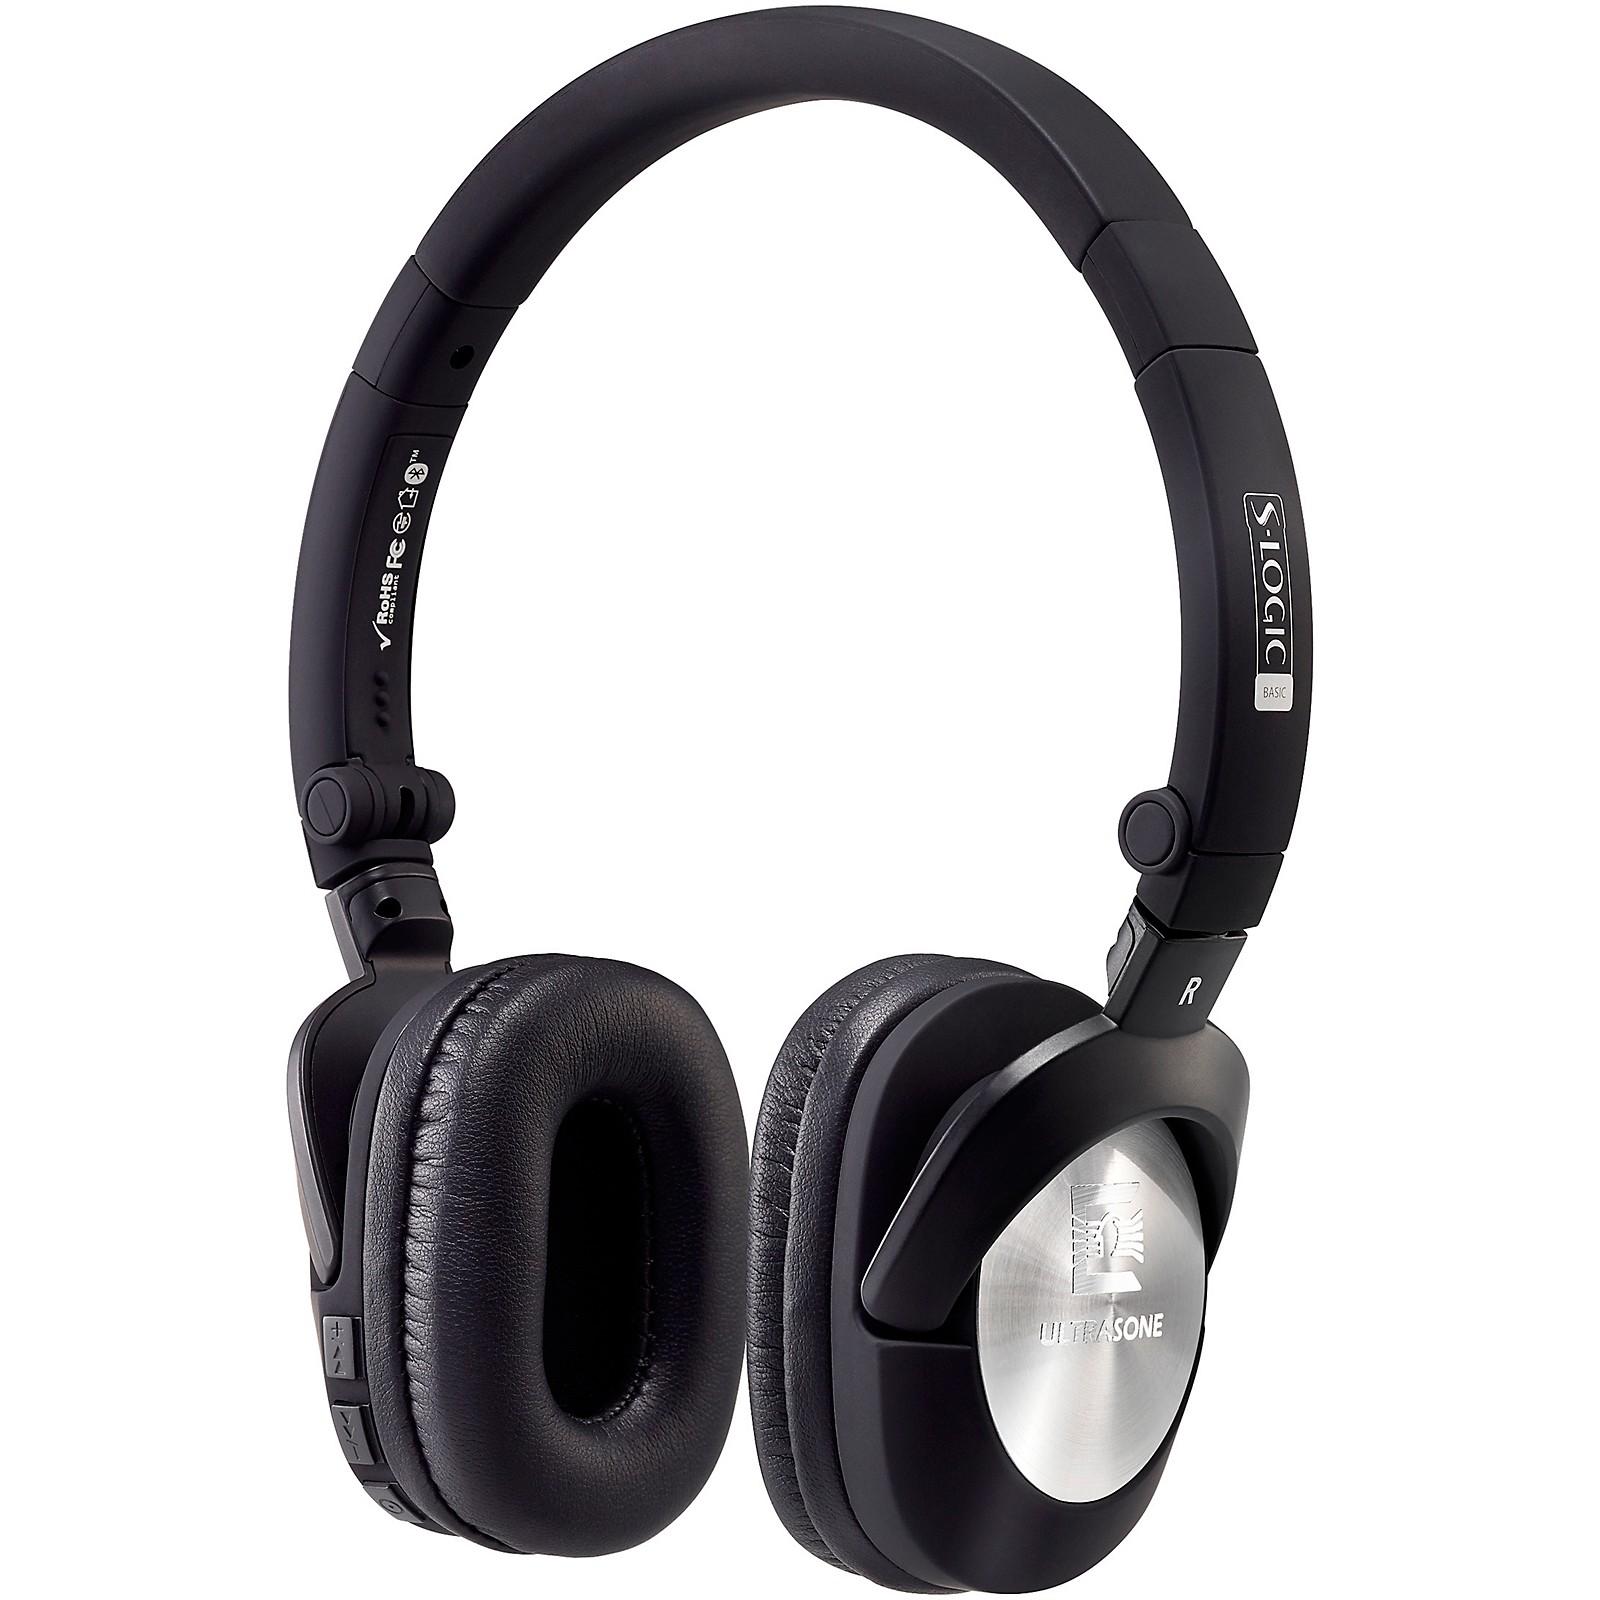 Ultrasone GO! Bluetooth Headphones with S-Logic Basic